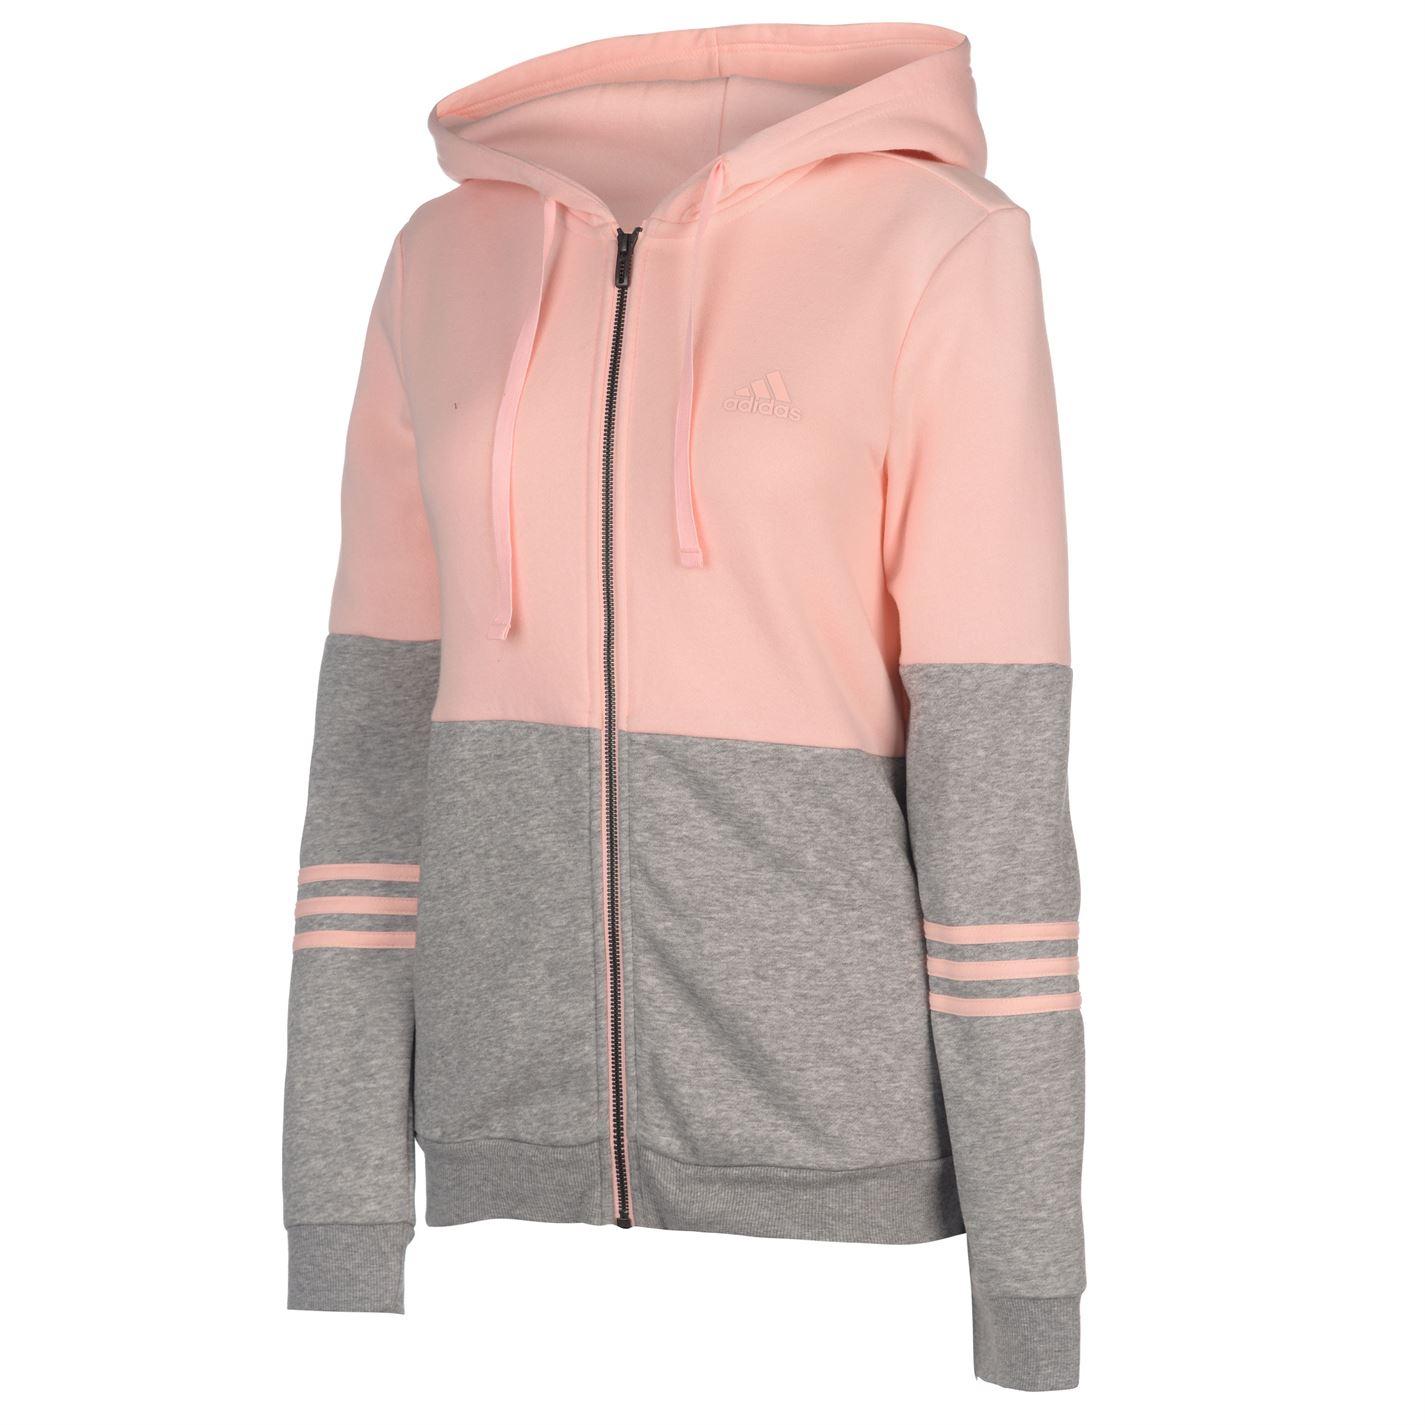 90ef7d57353 adidas Energize Tracksuit Ladies Fleece Full Length Sleeve Hooded ...